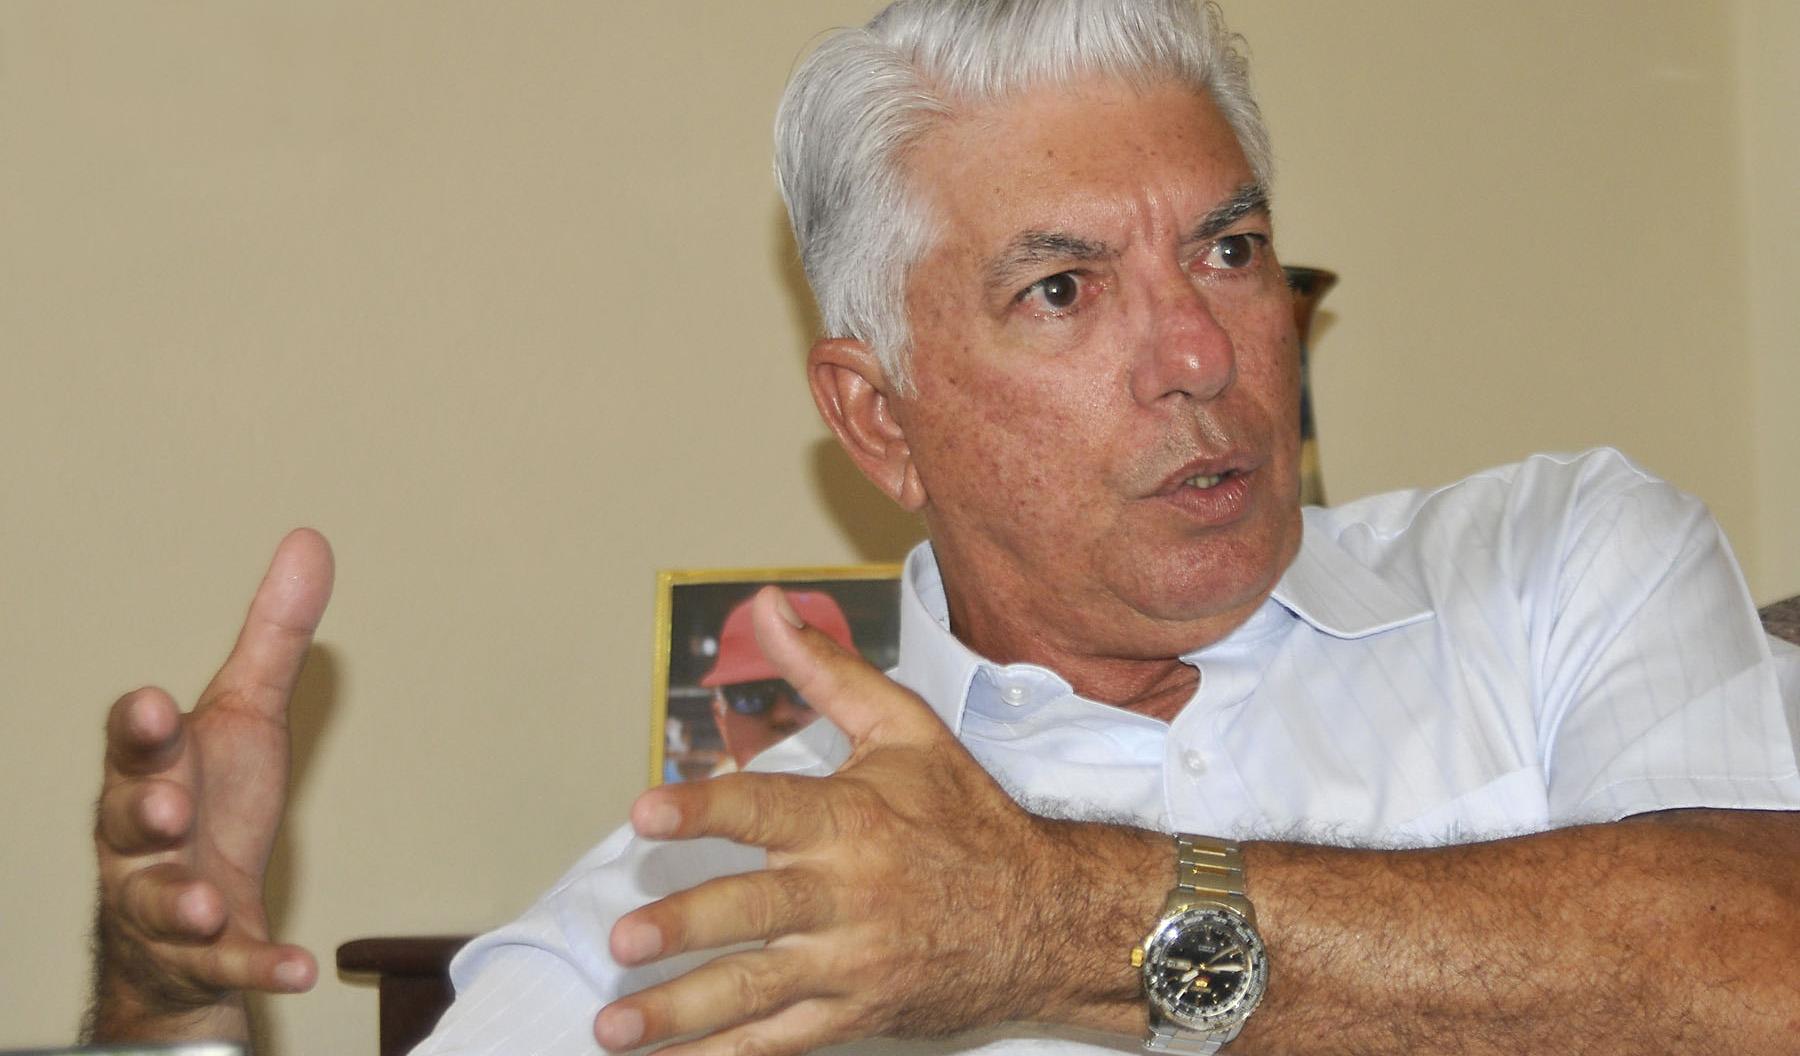 Jorge Fuentes, manager triunfador que no fue pelotero. Foto: José Raúl Rodríguez Robleda.